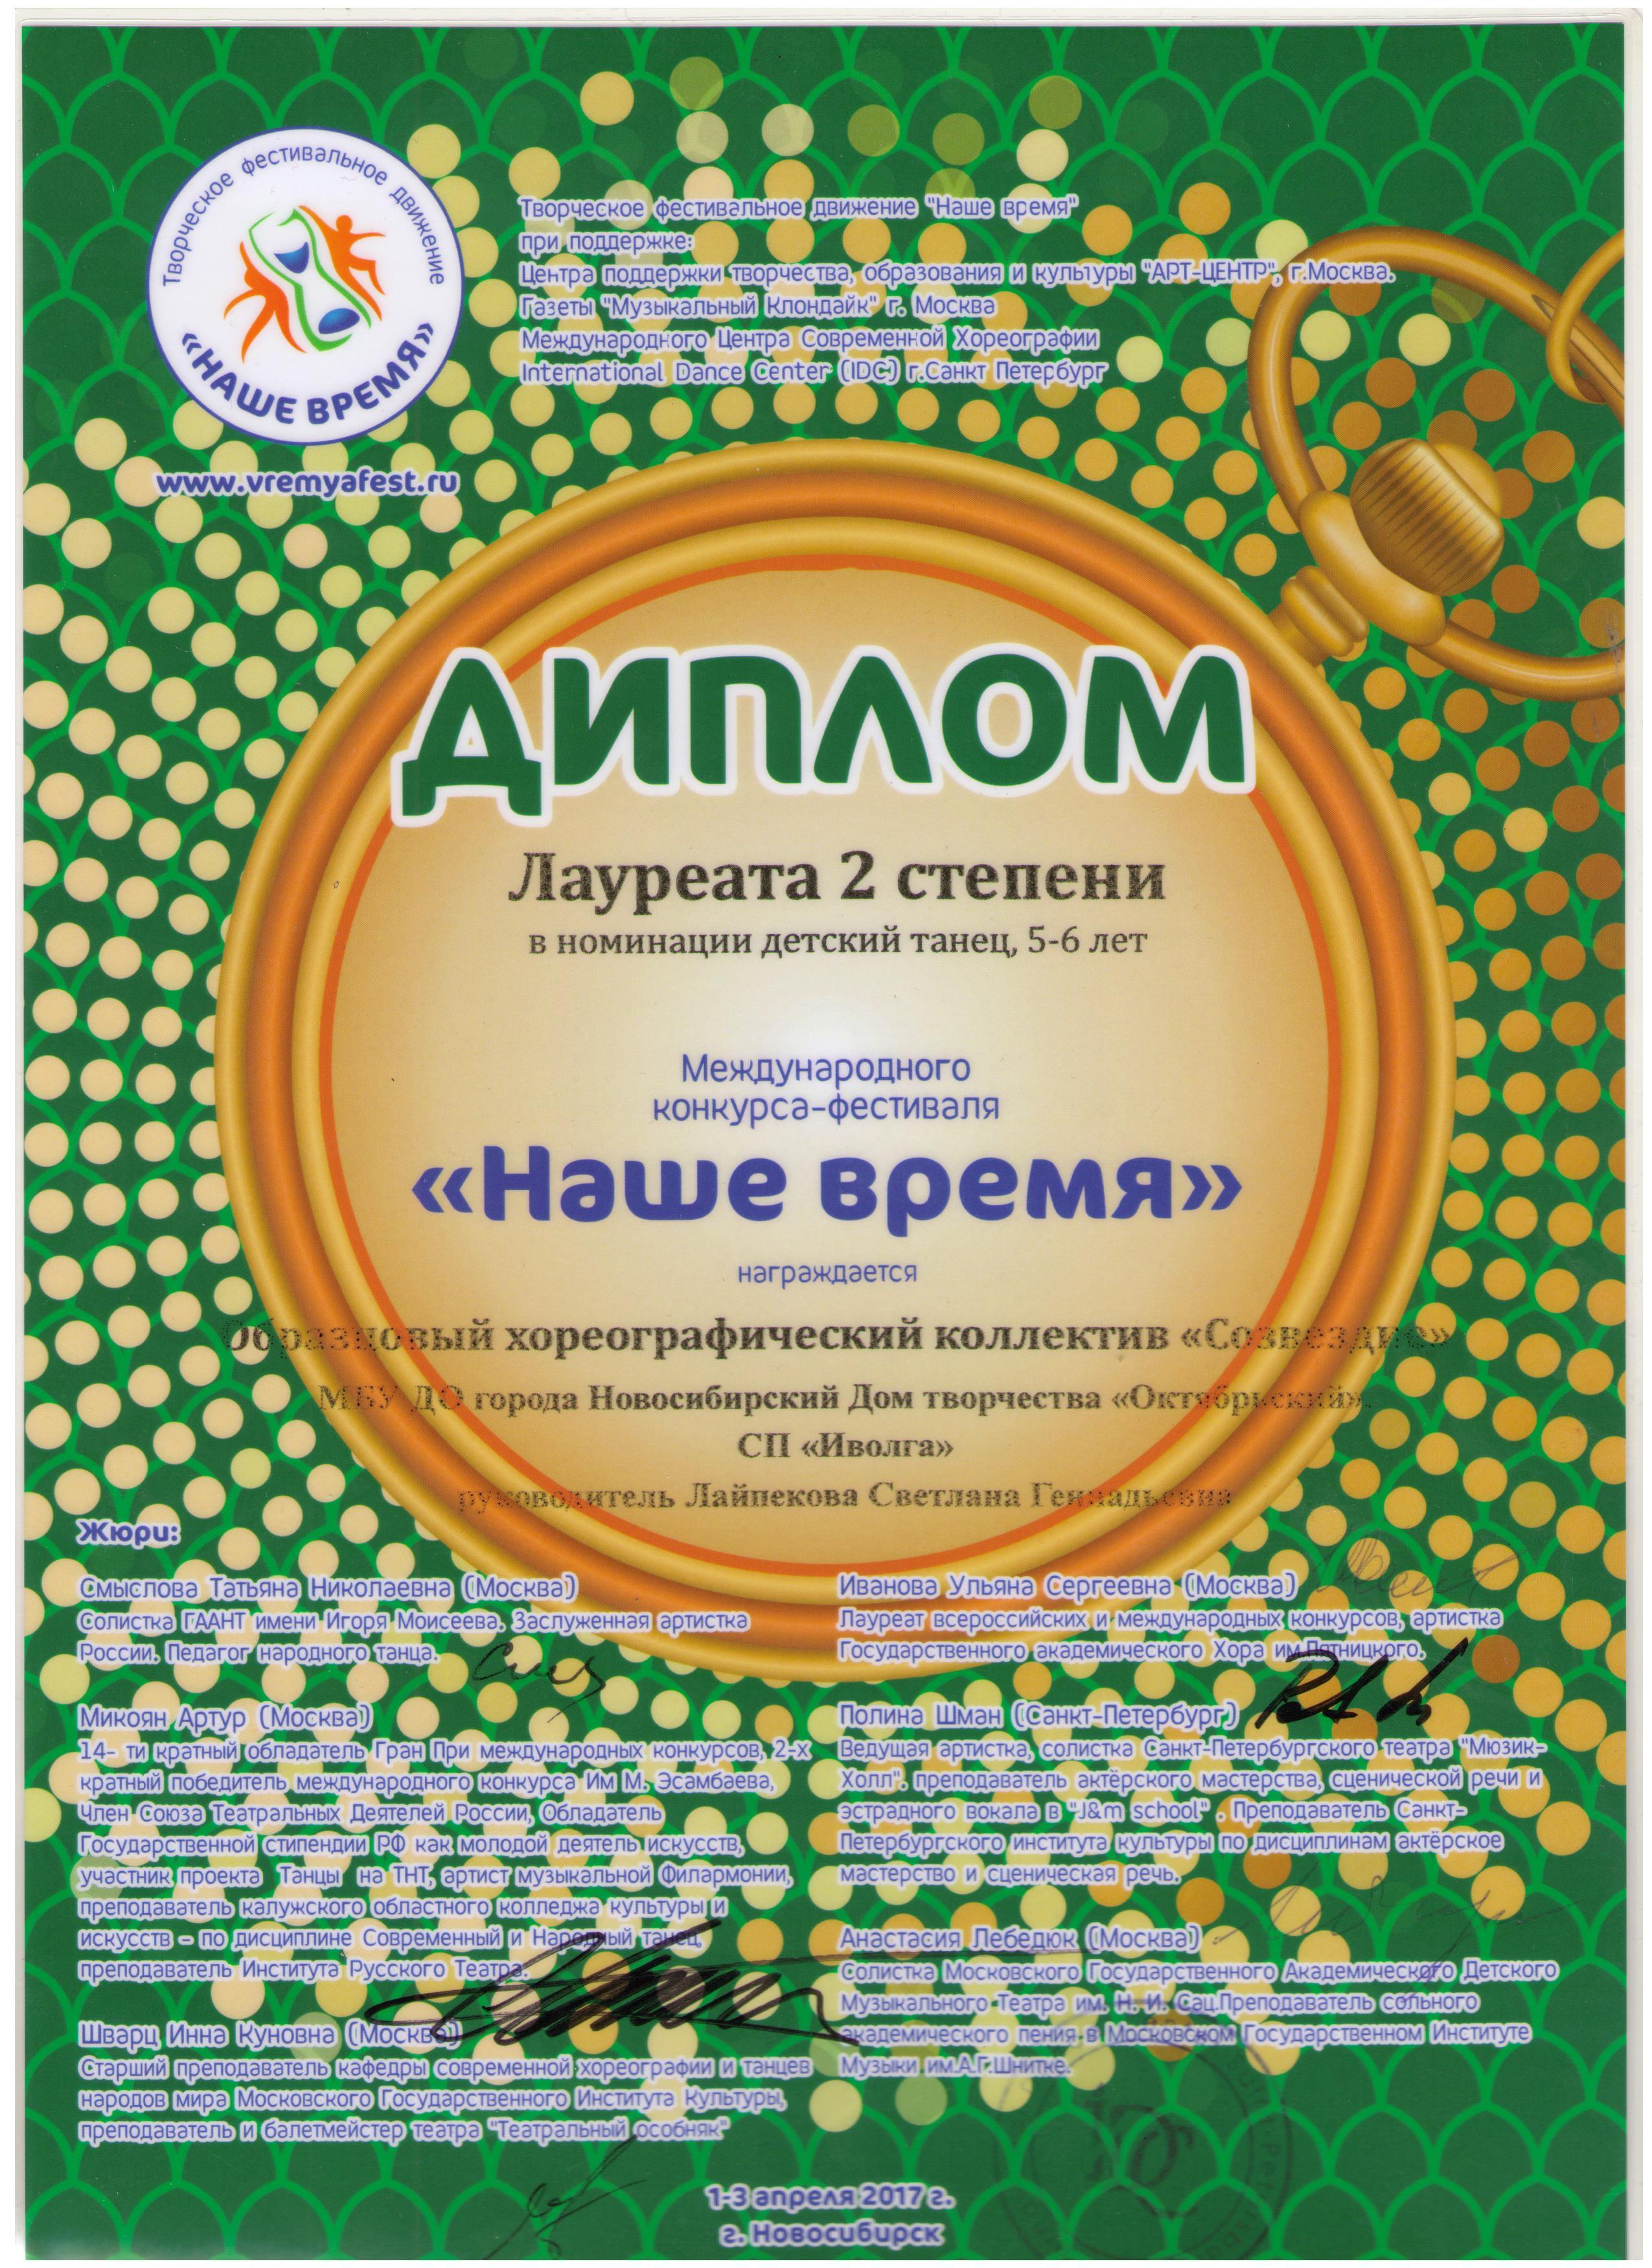 Laureat-2-st_nashe-vremya_02.04.17-001